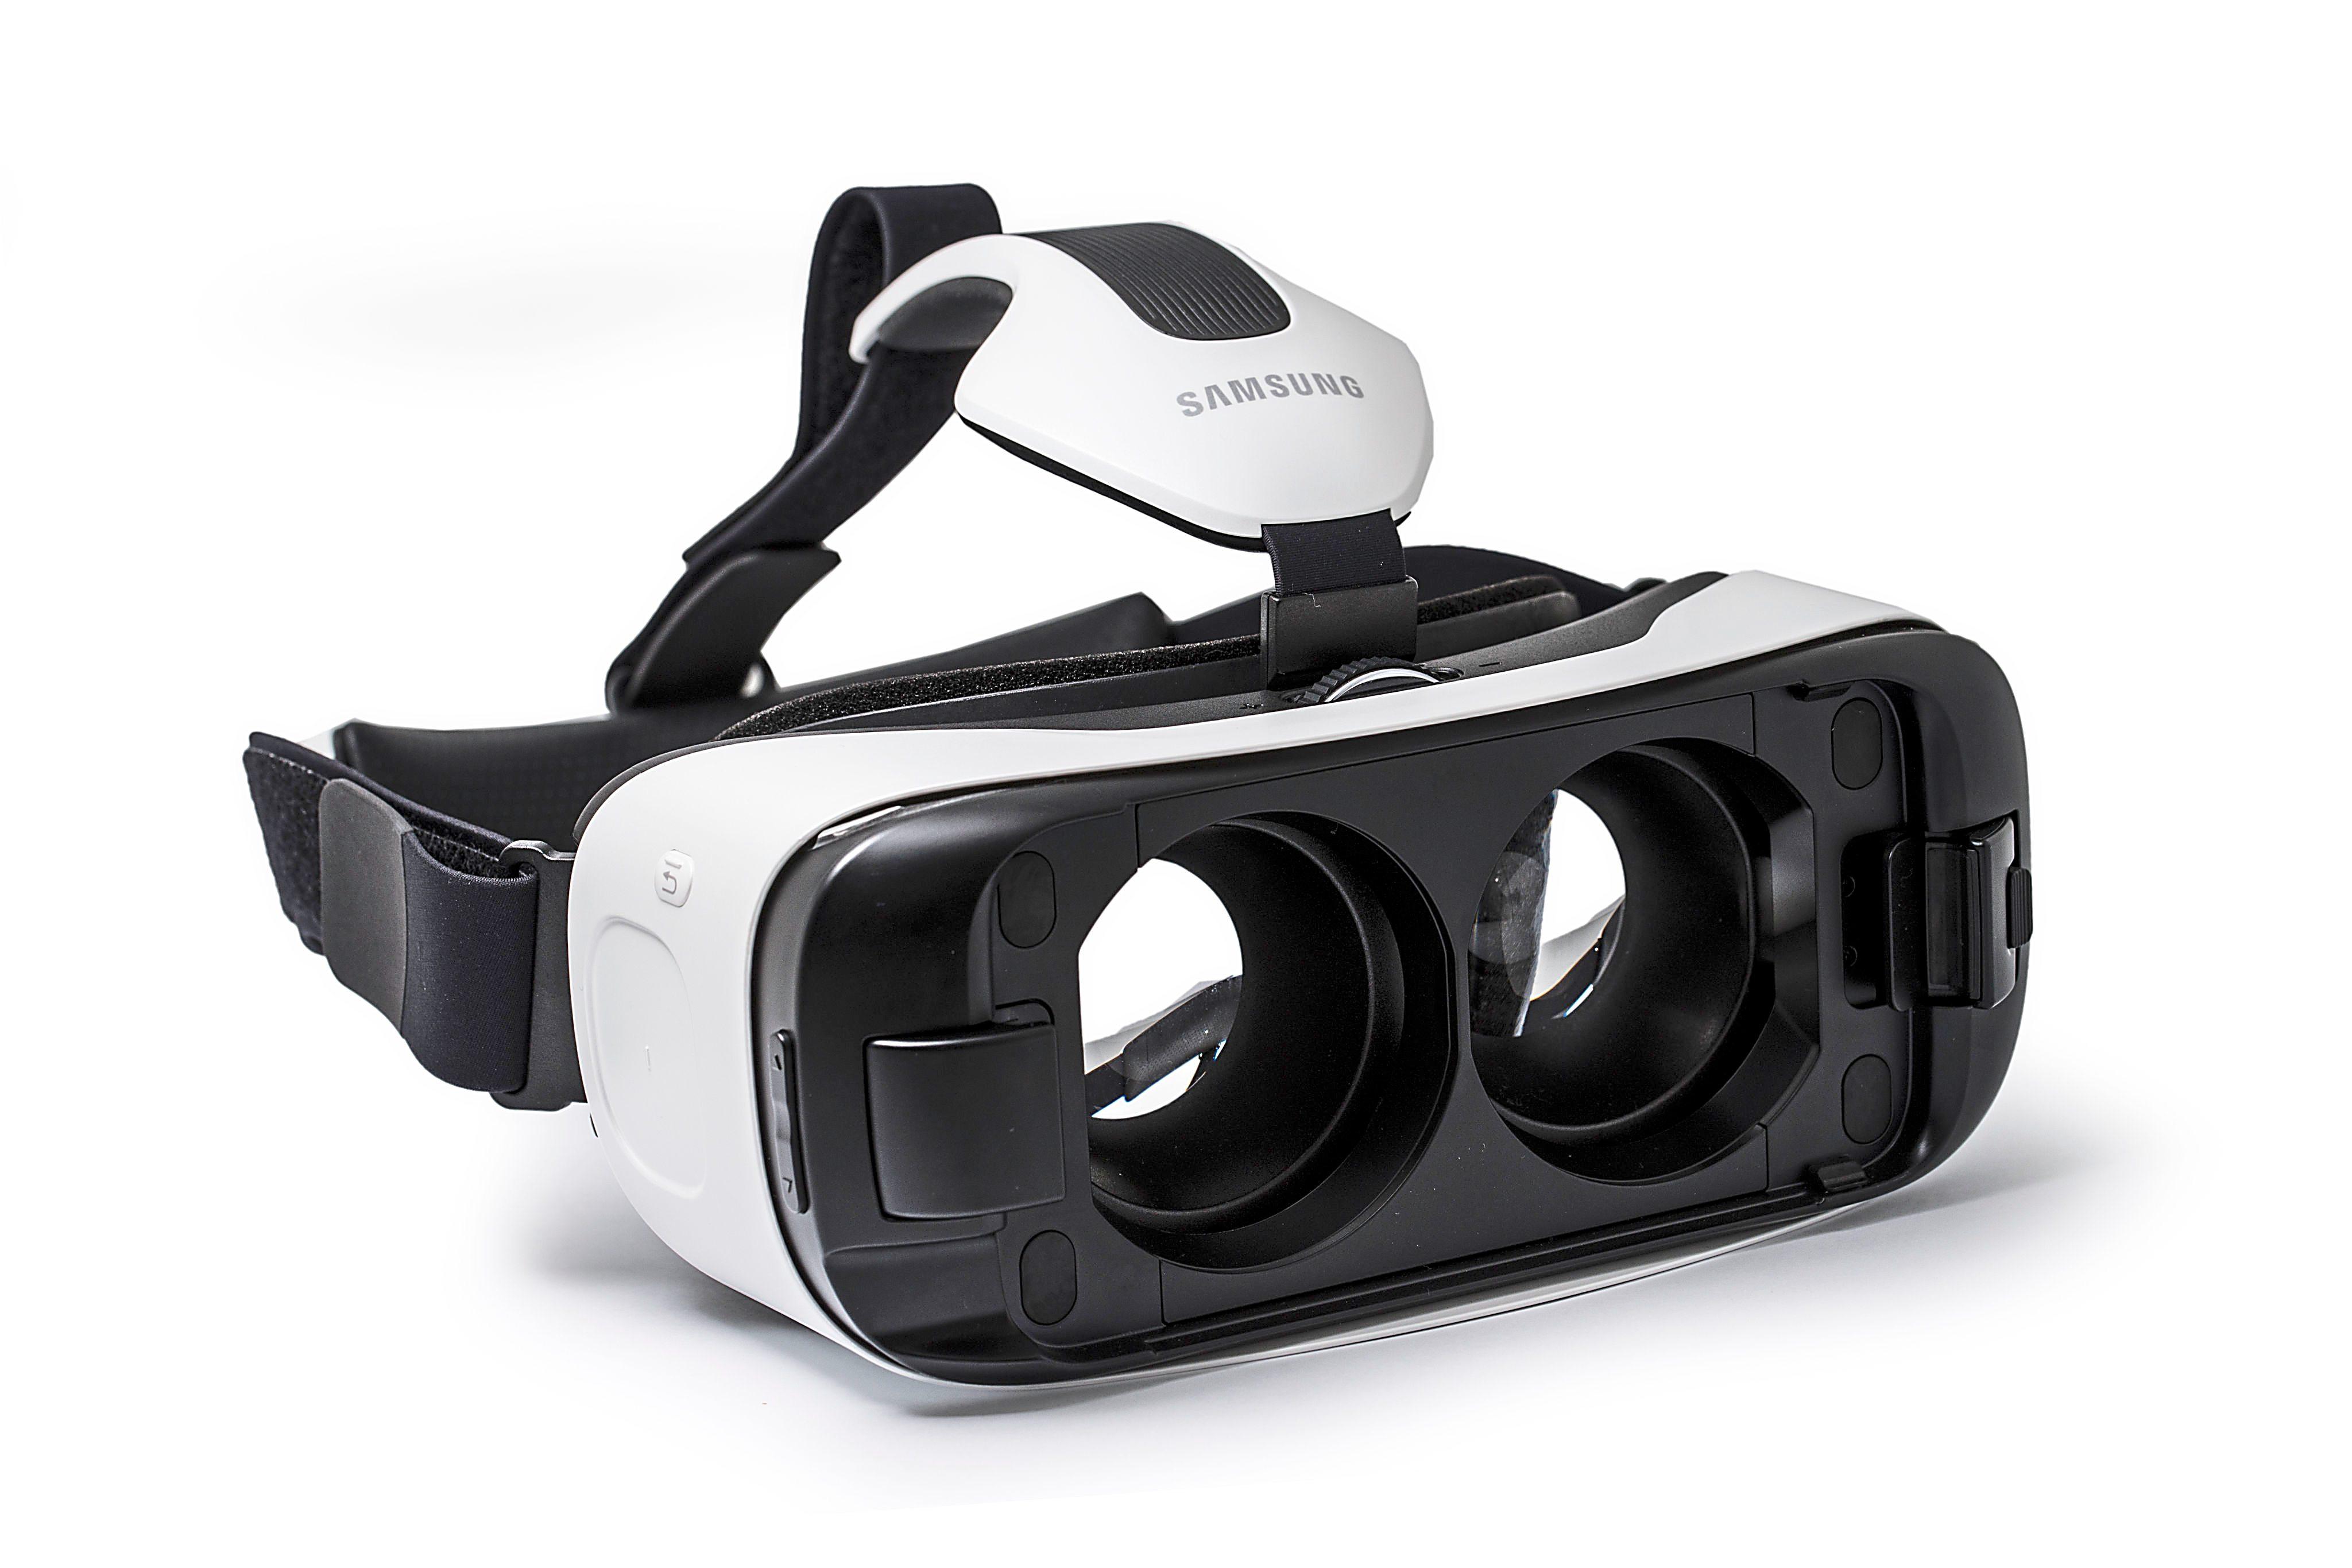 Samsung Gear VR: Sight beyond sight | The Star Online